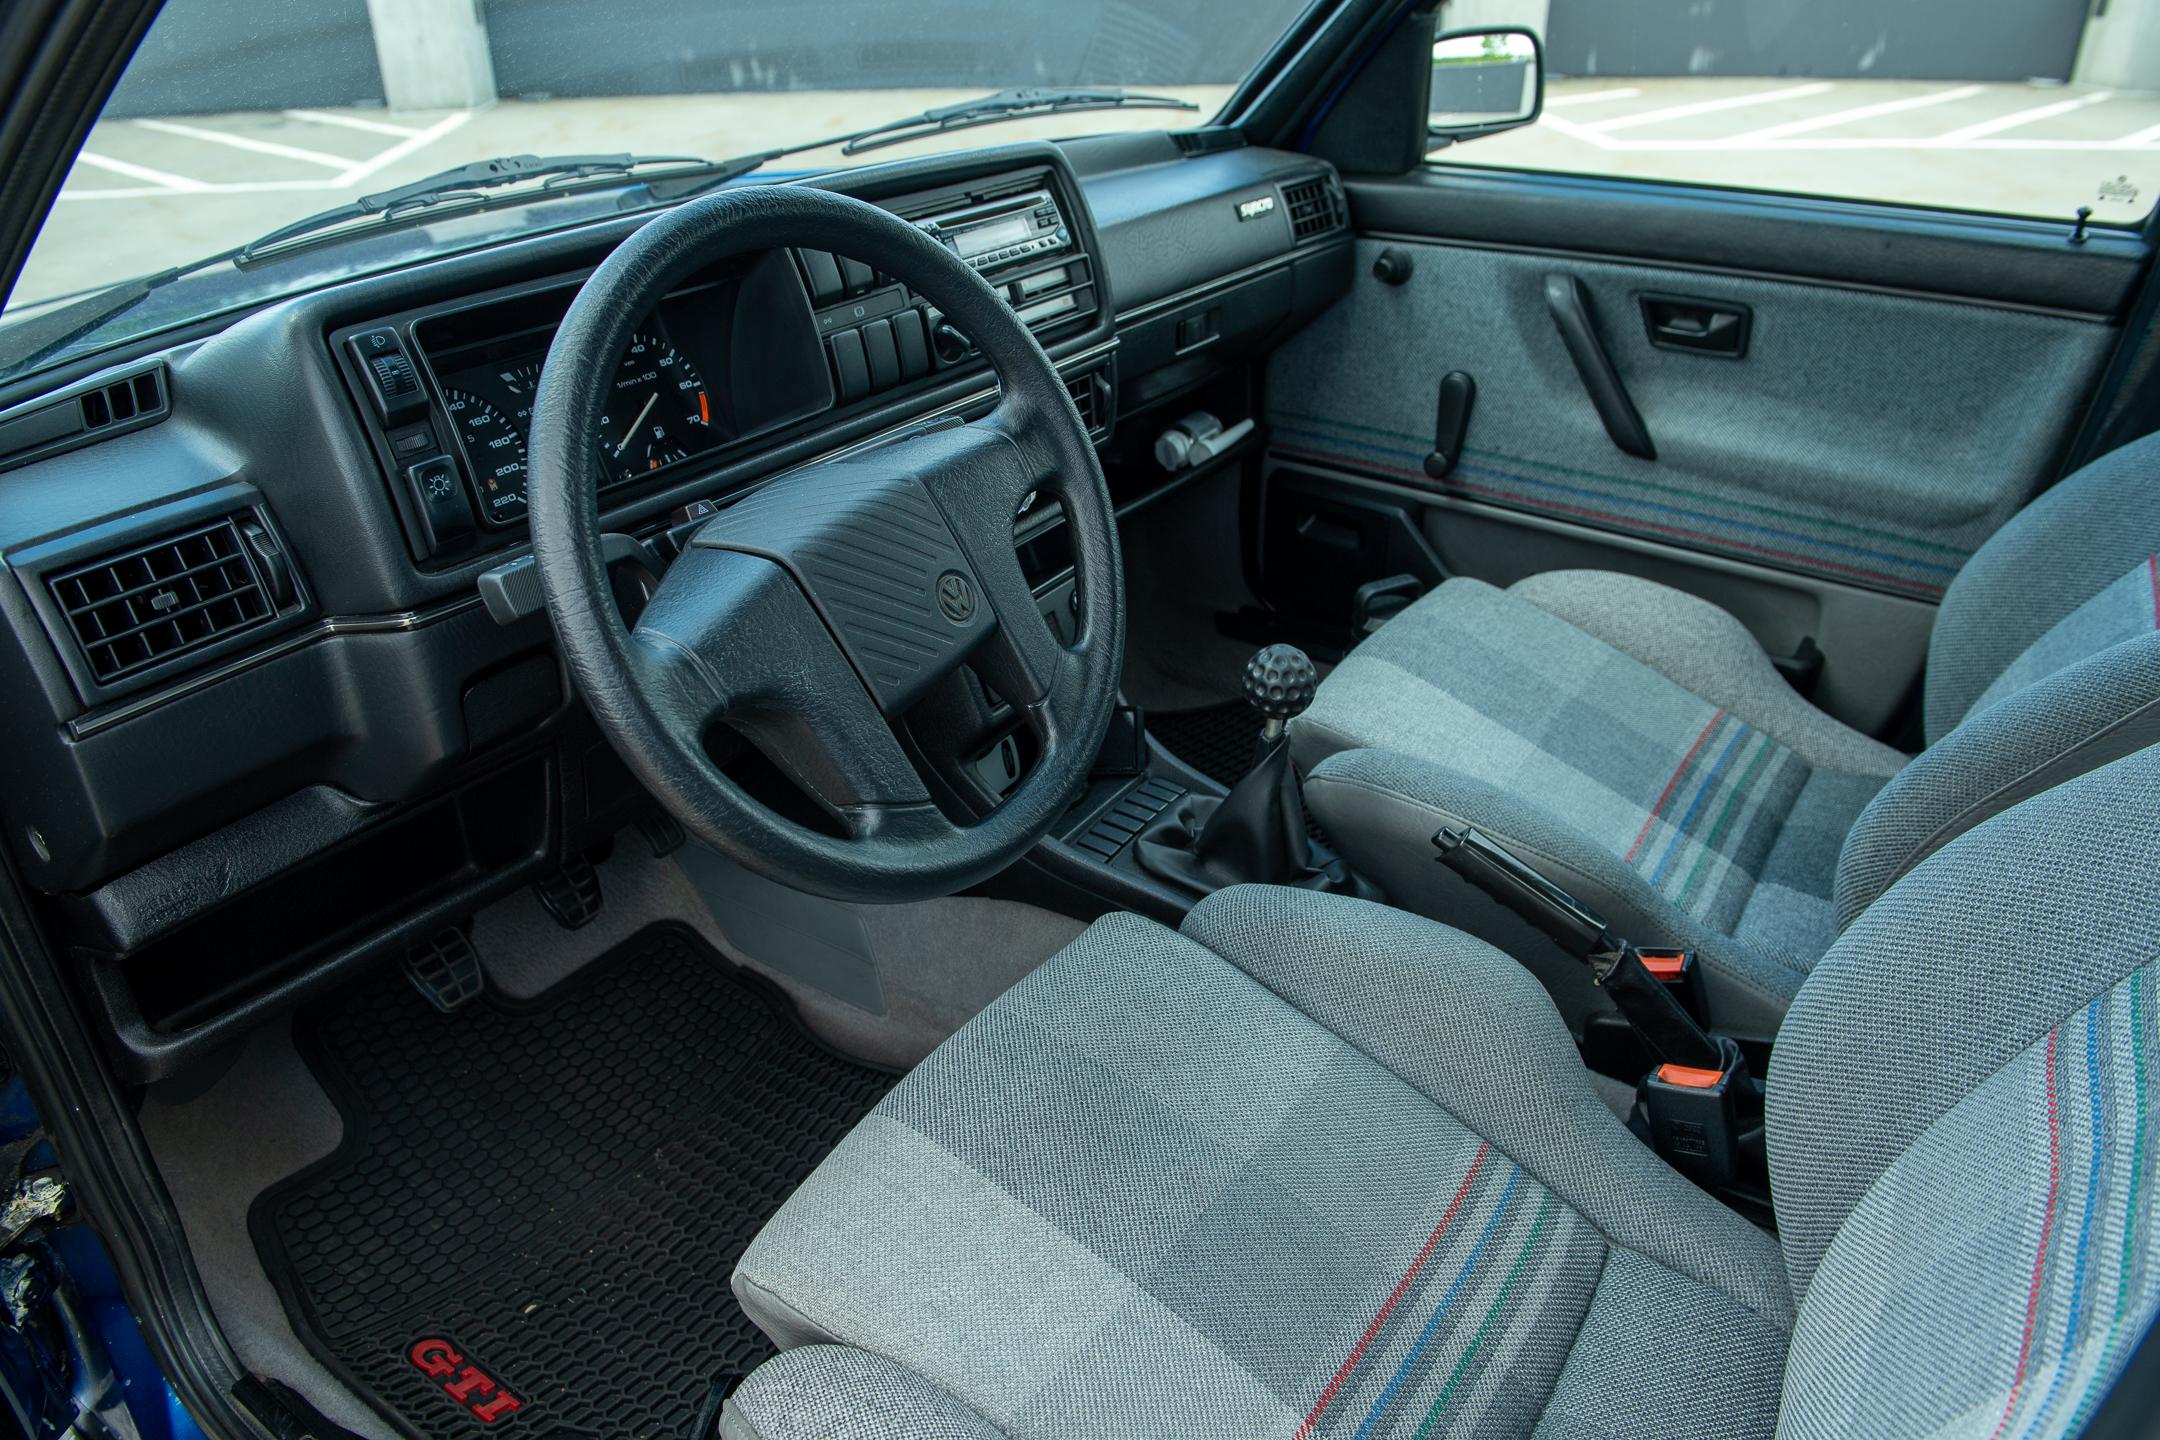 Volkswagen Golf Country interior wheel and dash